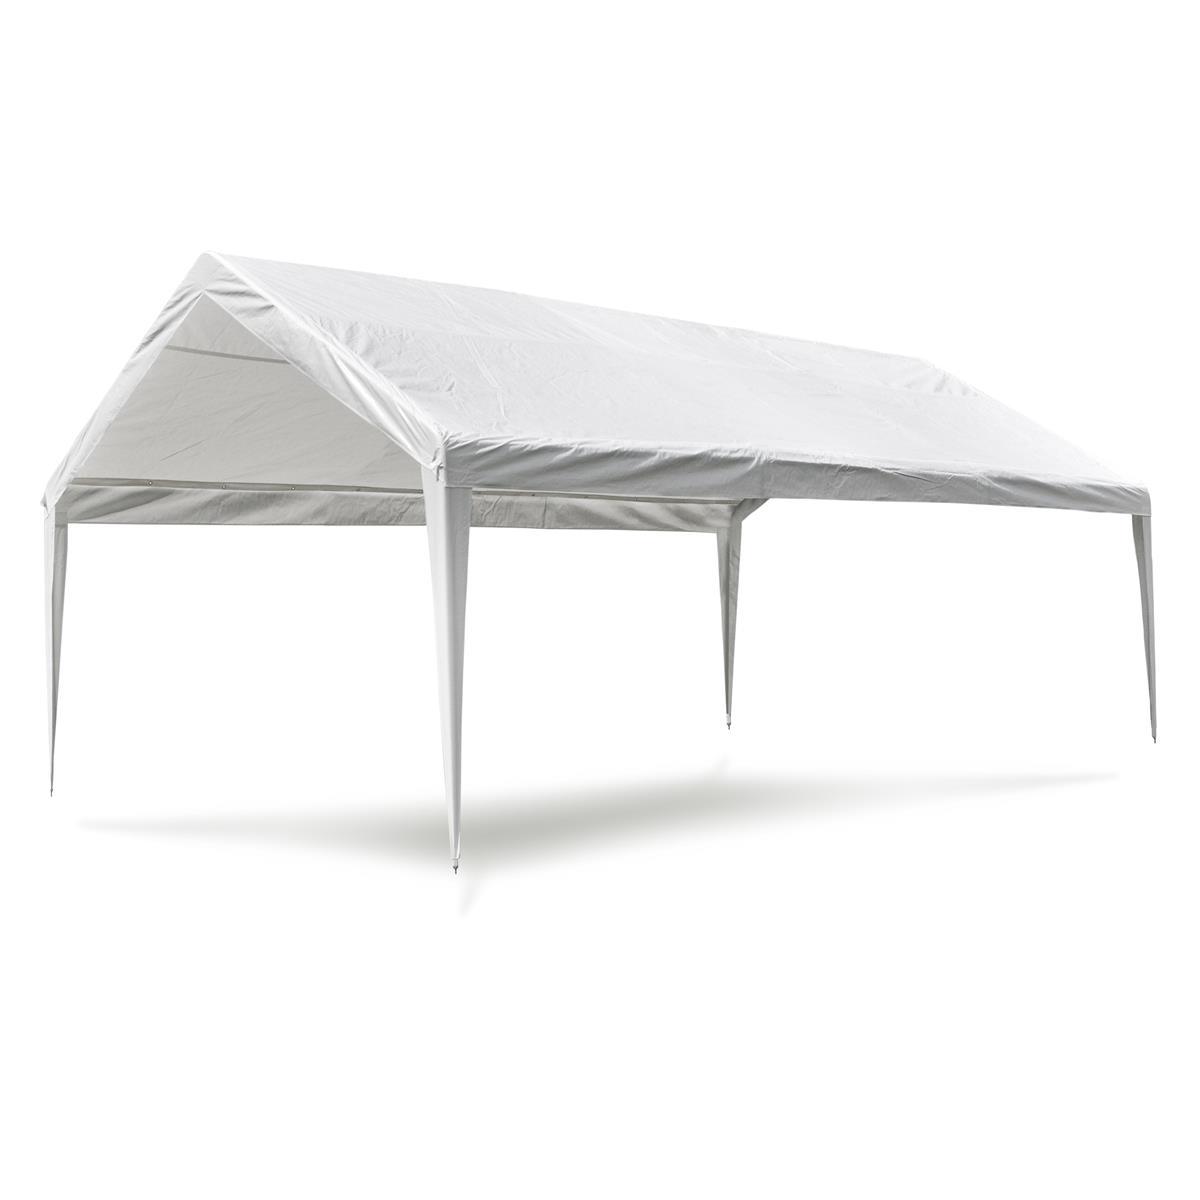 Ersatzdach Dachplane für Partyzelt Pavillon Zelt Festzelt PE 4 x 6m weiß